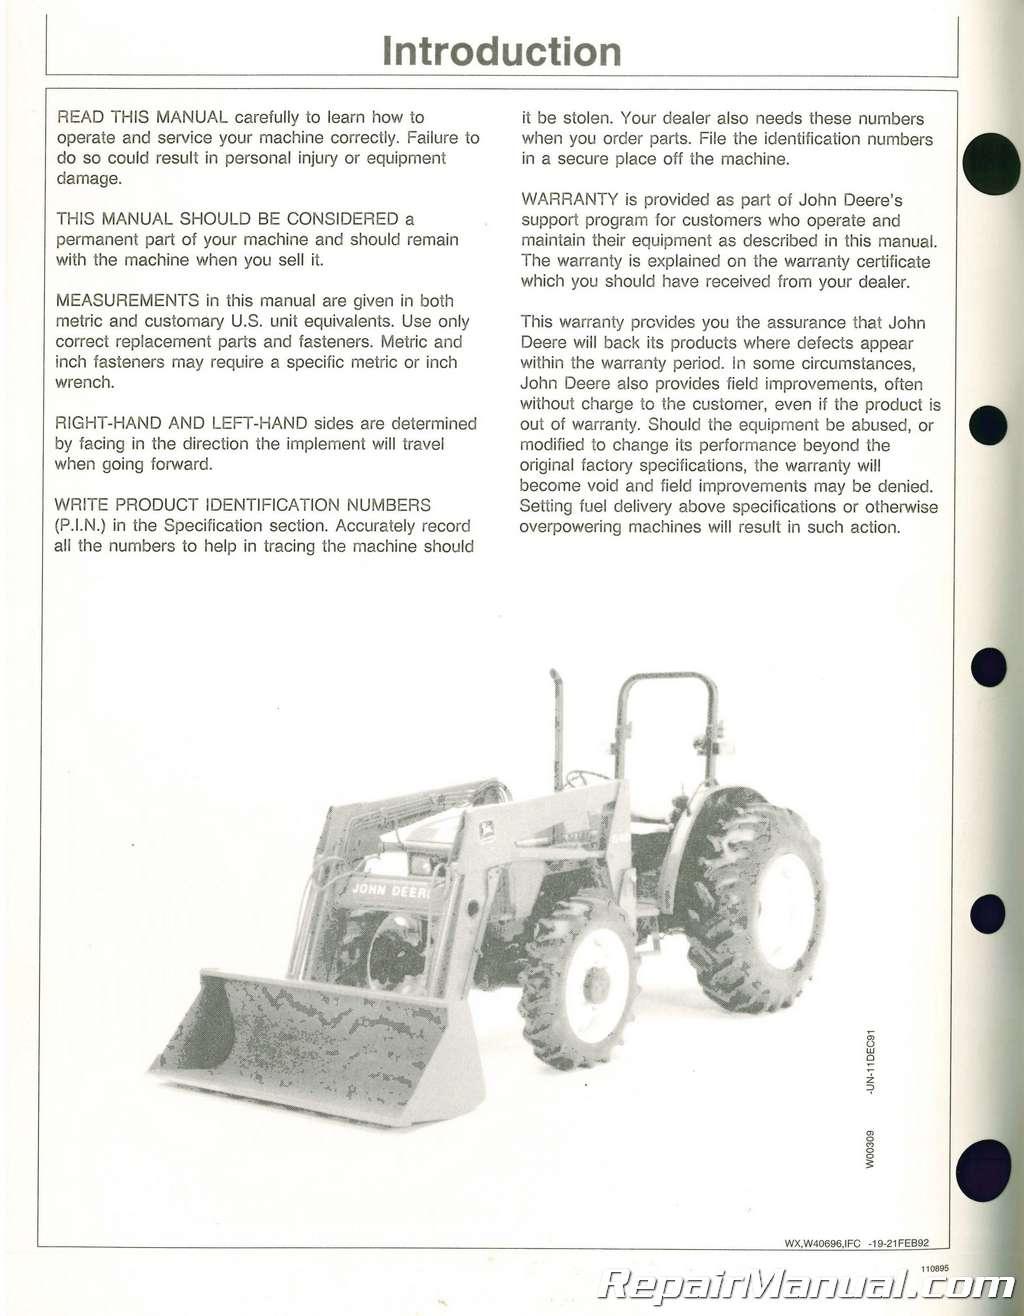 used john deere 520 540 loader operators manual rh repairmanual com John Deere GT225 Manual John Deere Parts Catalog